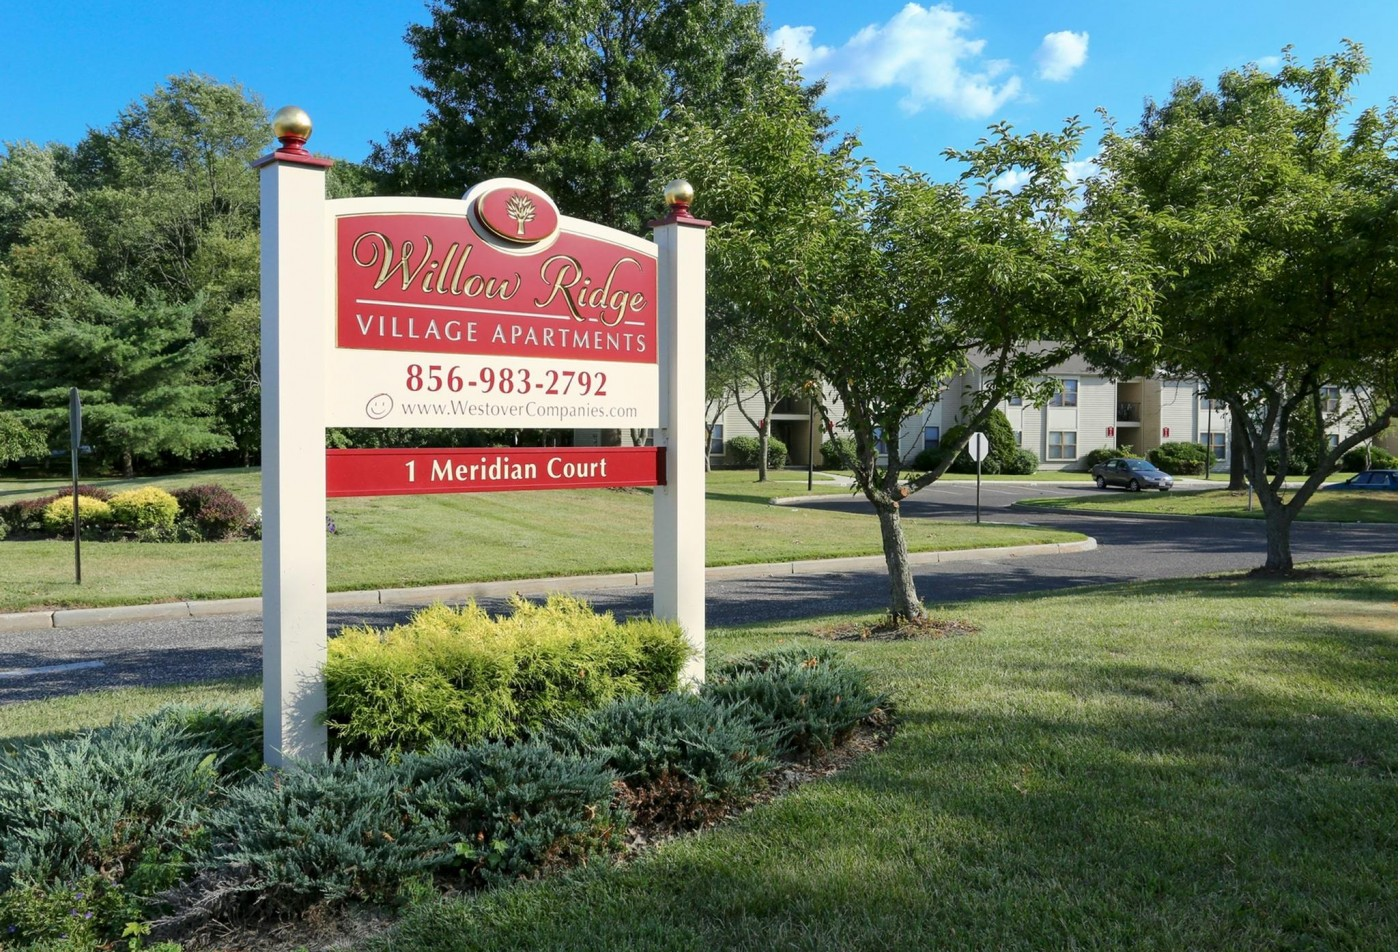 Apartments in Marlton, NJ | Willlow Ridge Village Apartments